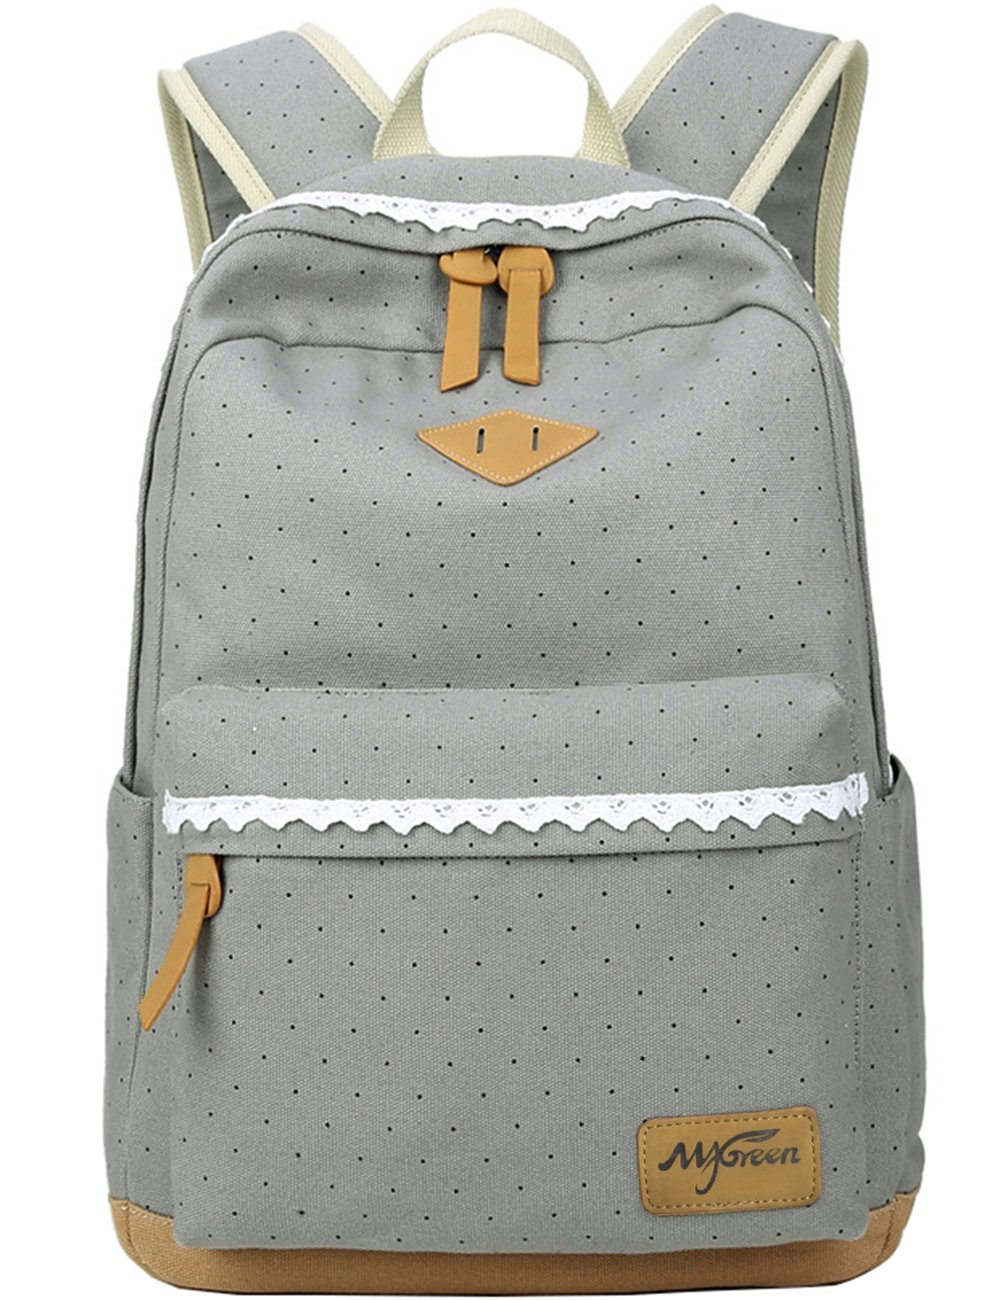 Mygreen Casual Dot 14 Inch Laptop Backpacks Kawaii Girls Canvas Portable School Backpack Grey